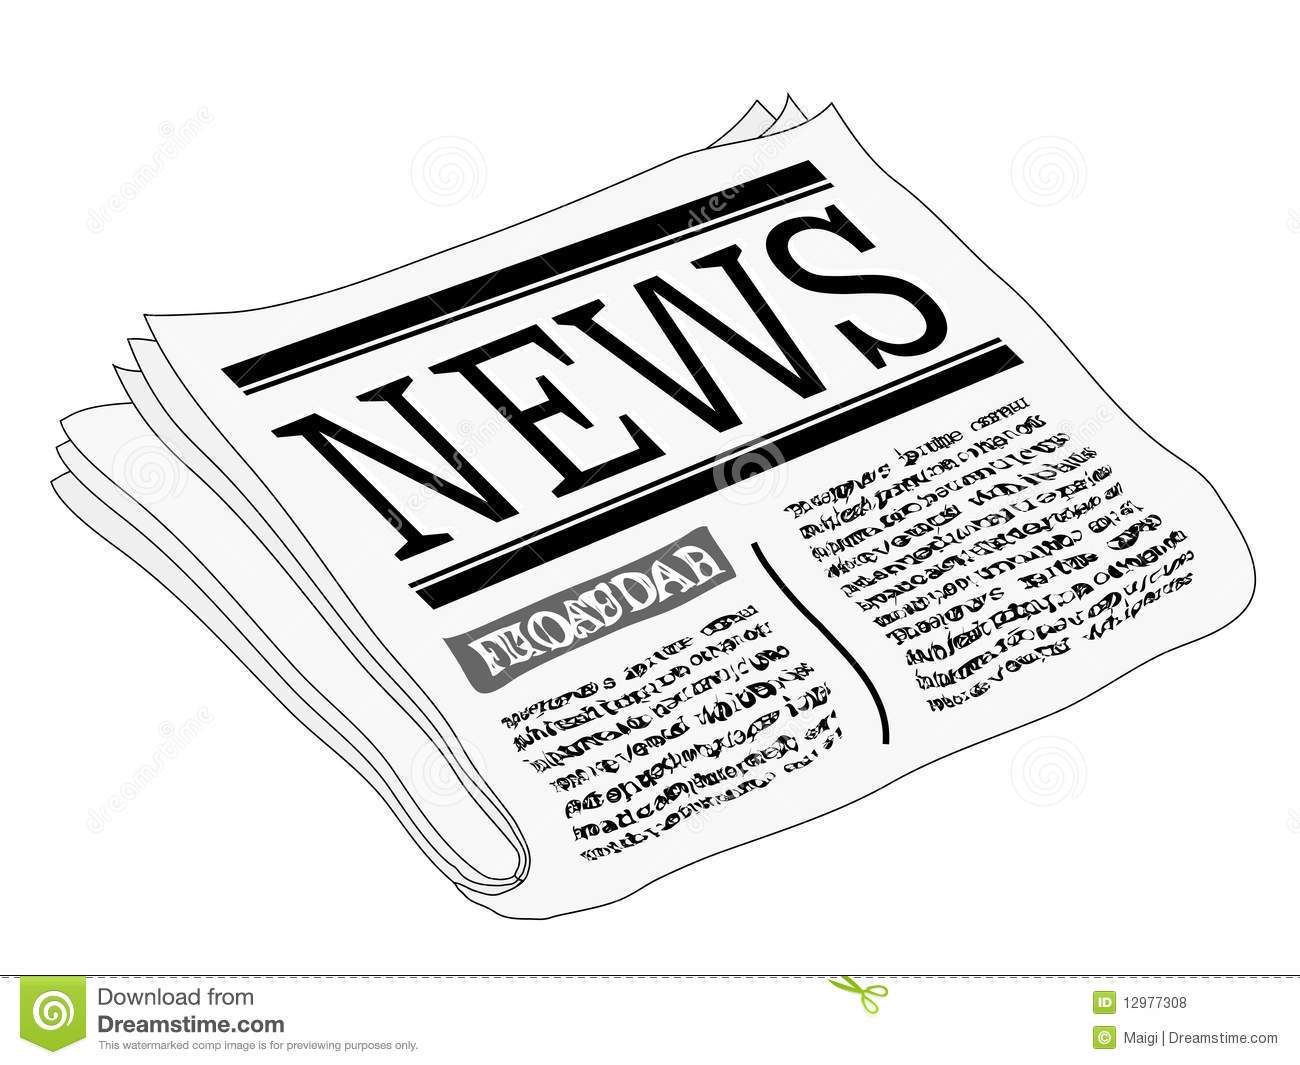 Newspaper-clipart-newspaper-12977308-newspaper-clipart-newspaper-12977308-4